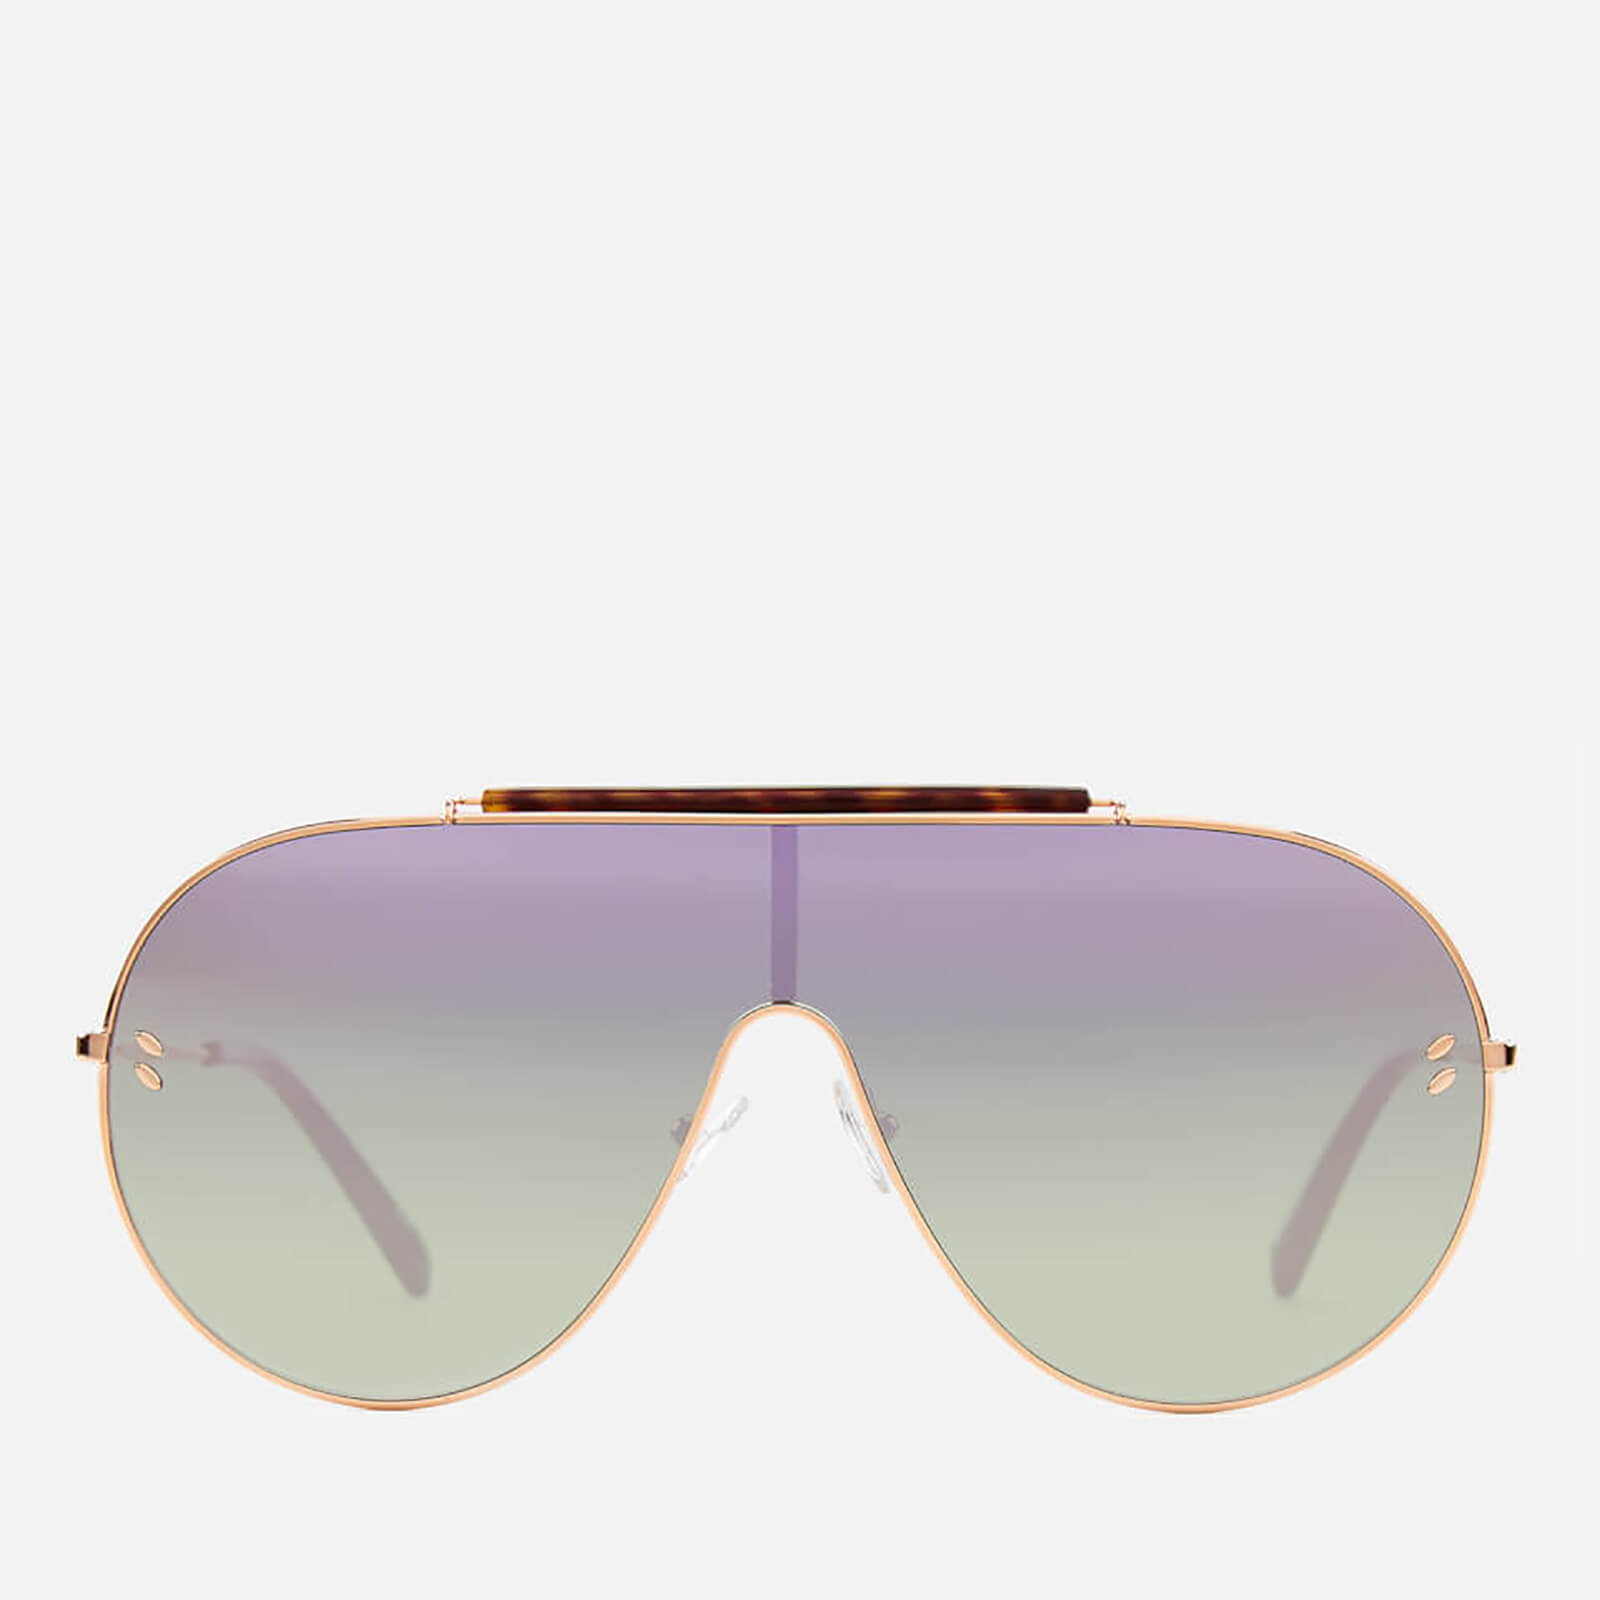 b0ba2c0ab0d9 Stella McCartney Women's Large Aviator Sunglasses - Gold/Pink - Free UK  Delivery over £50